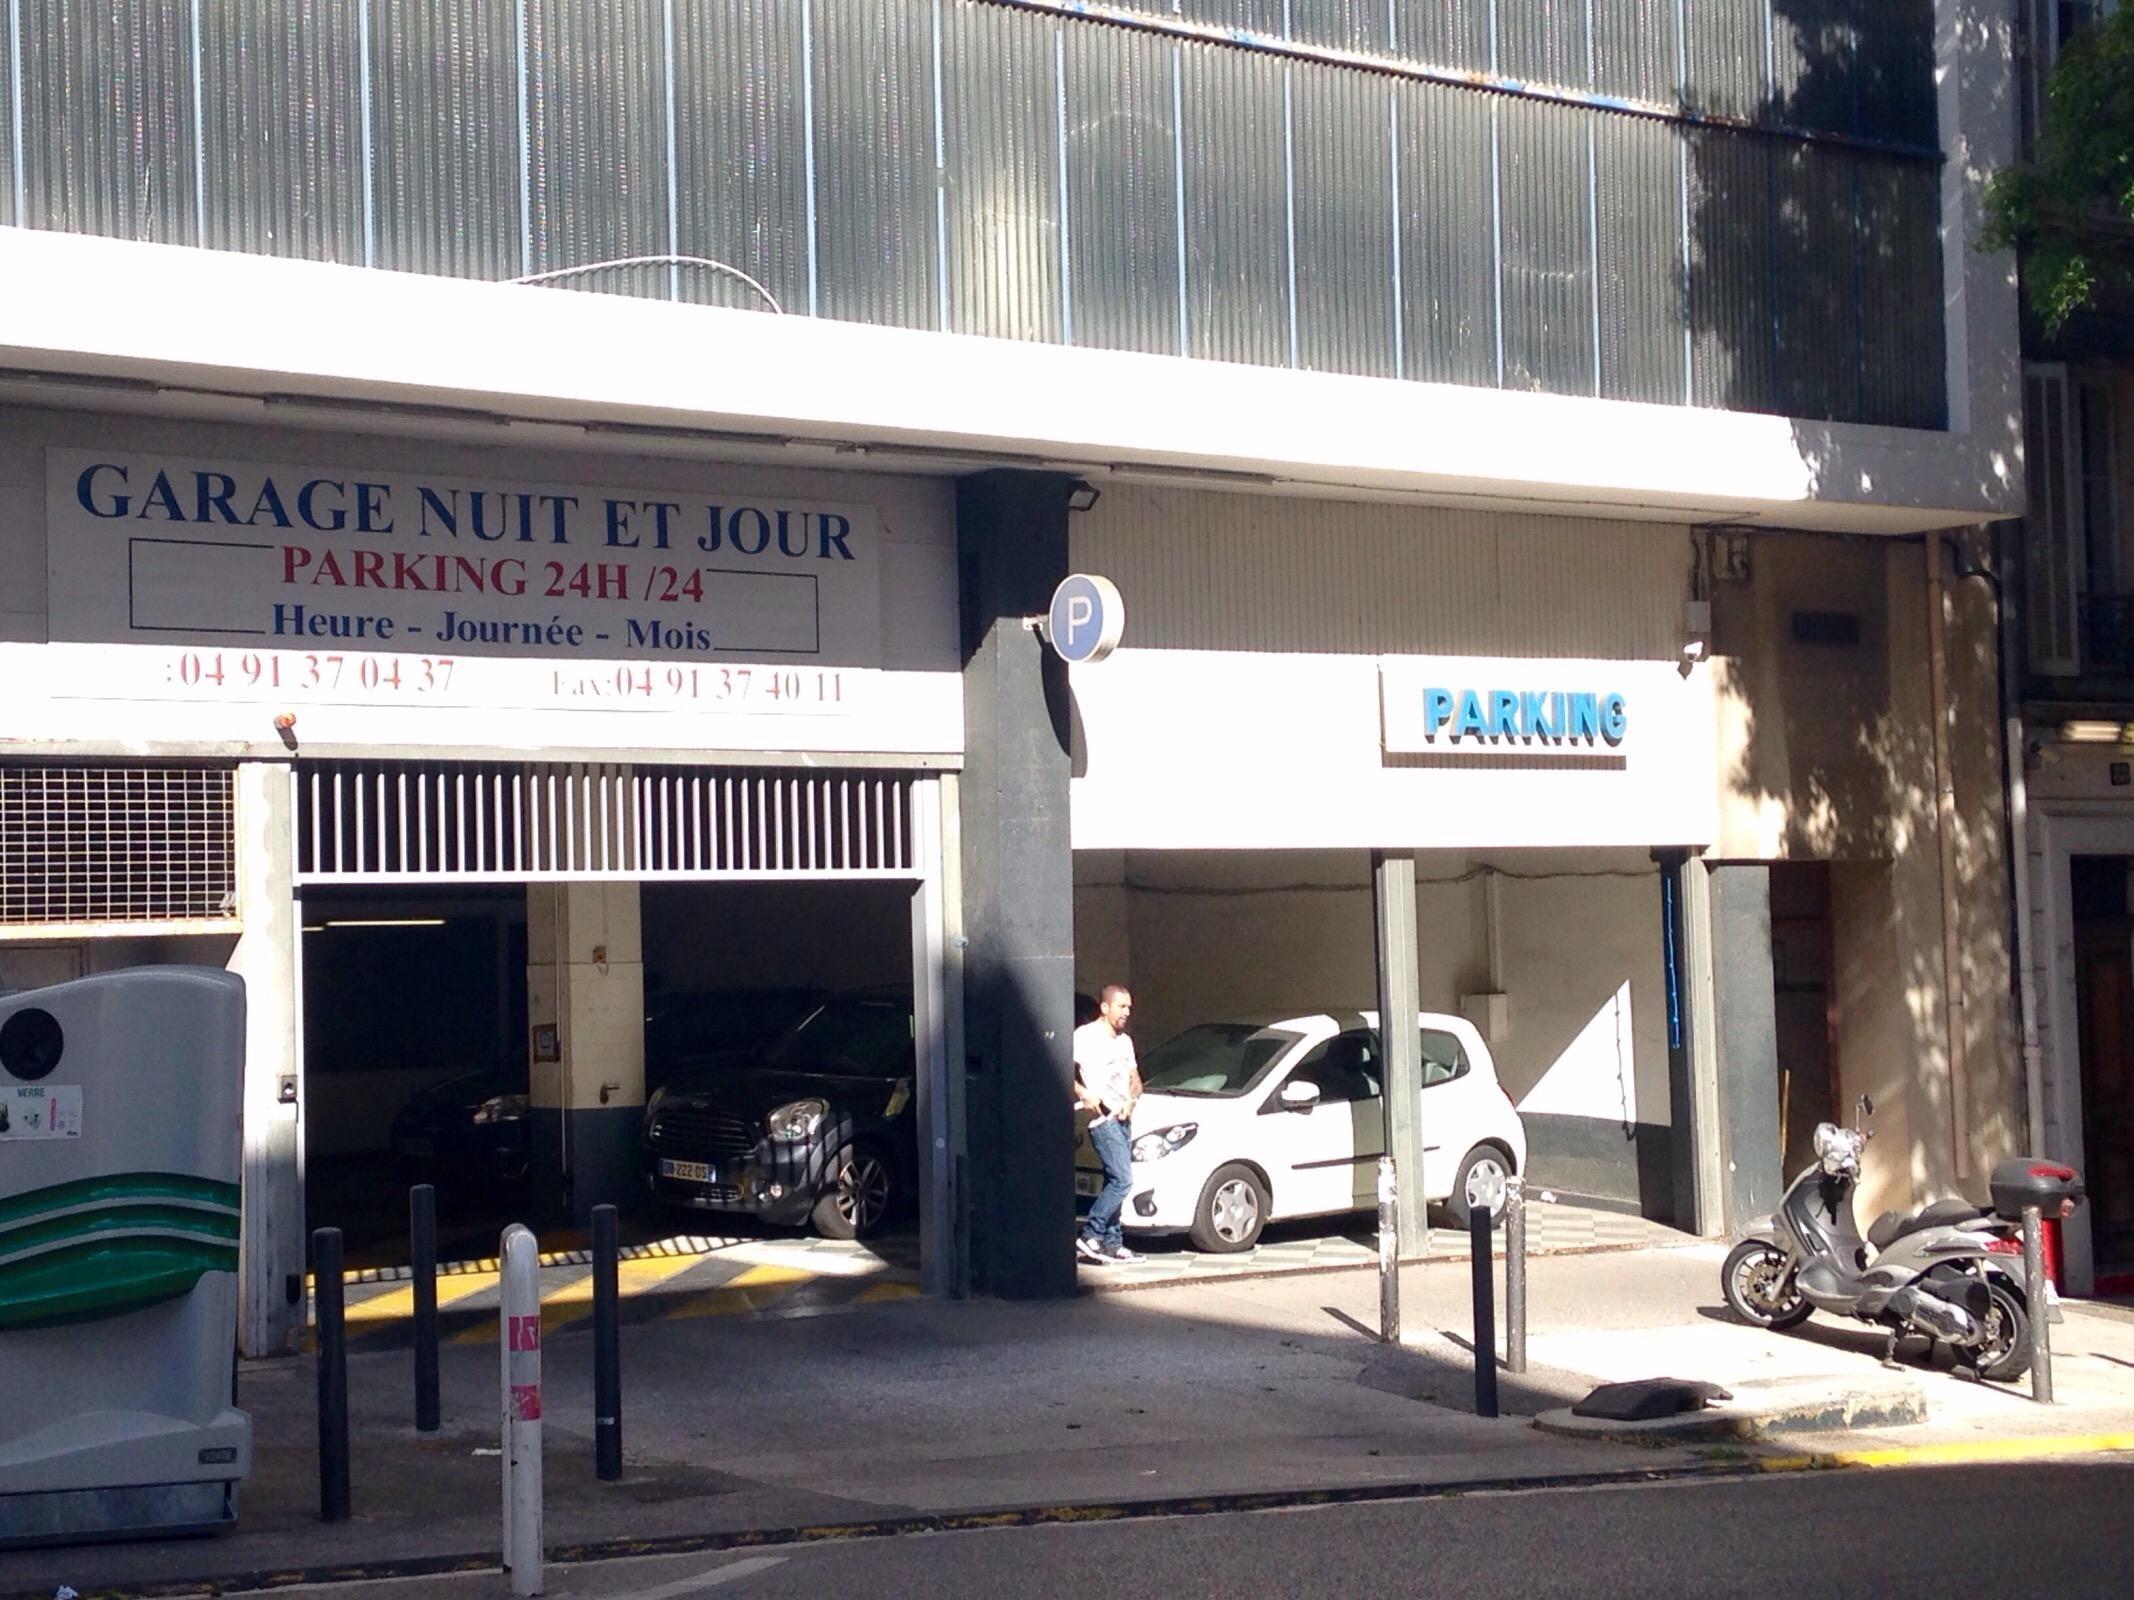 Garage nuit et jour parking in marseille parkme for Self garage marseille